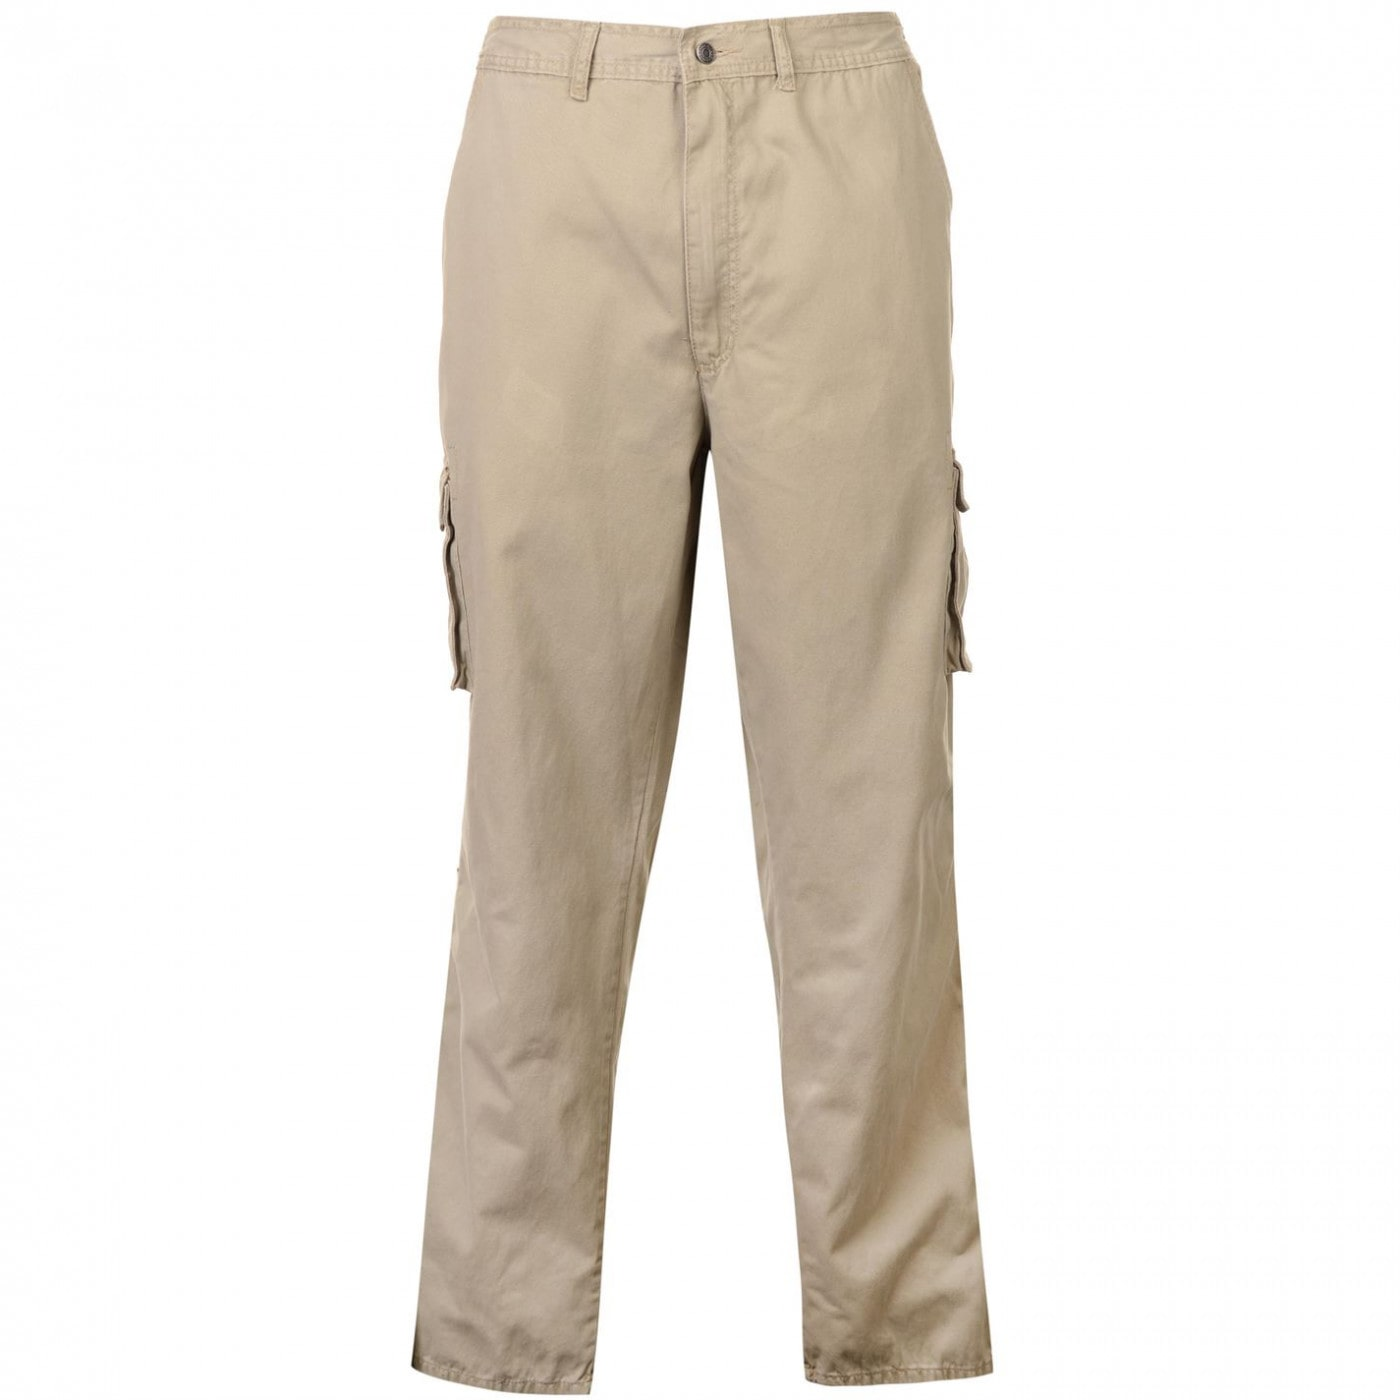 Full Blue Cargo Trousers Mens